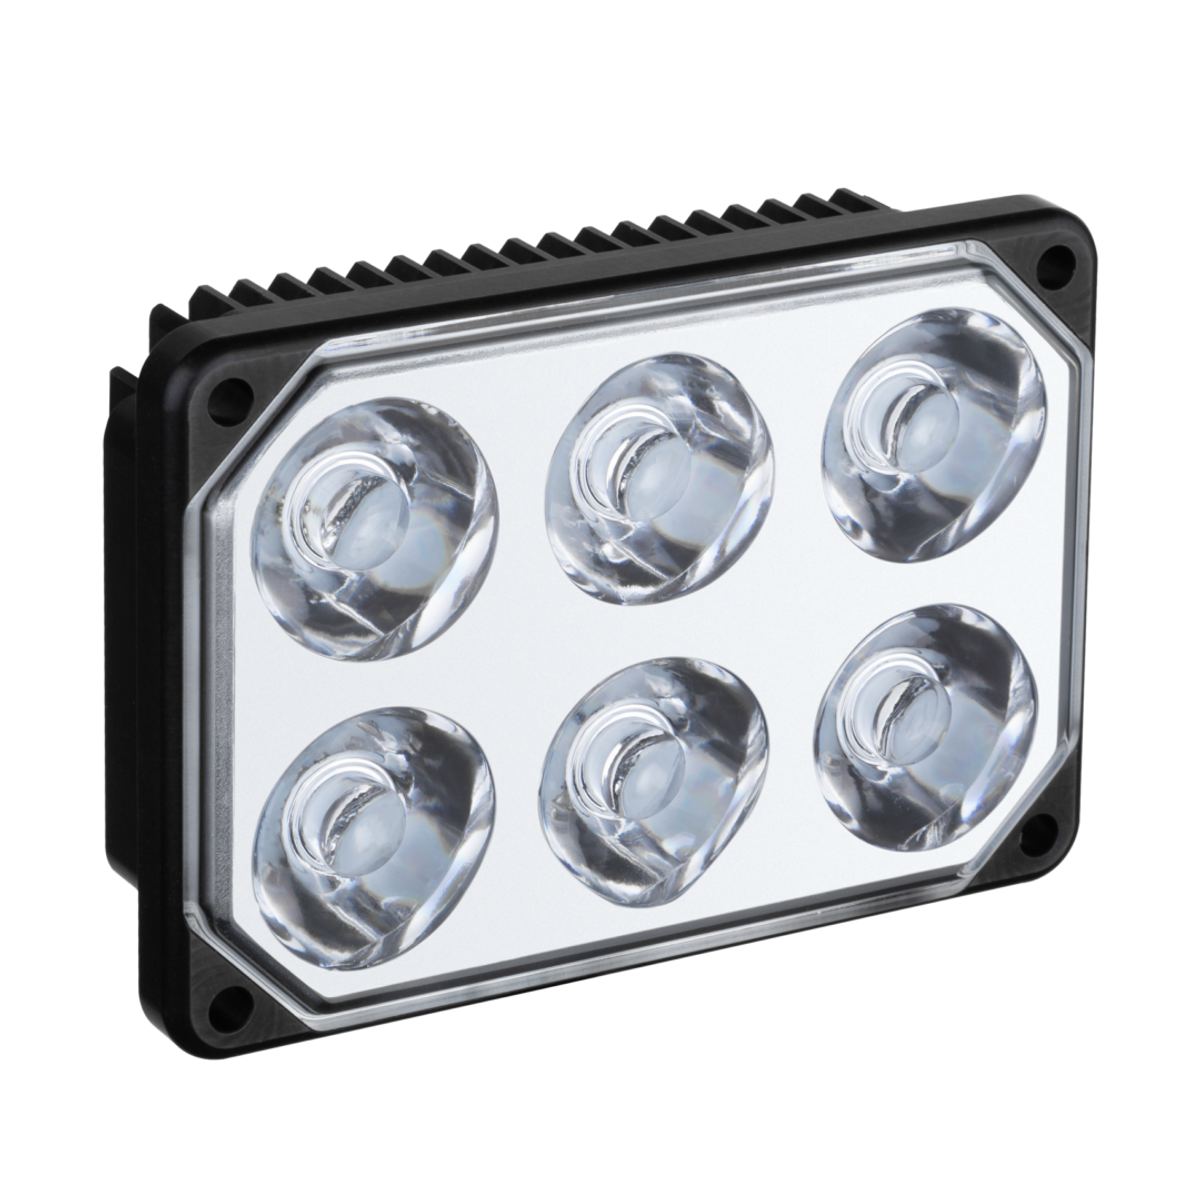 AeroLeds SunBeam Recognition Light. 9-36 Volts